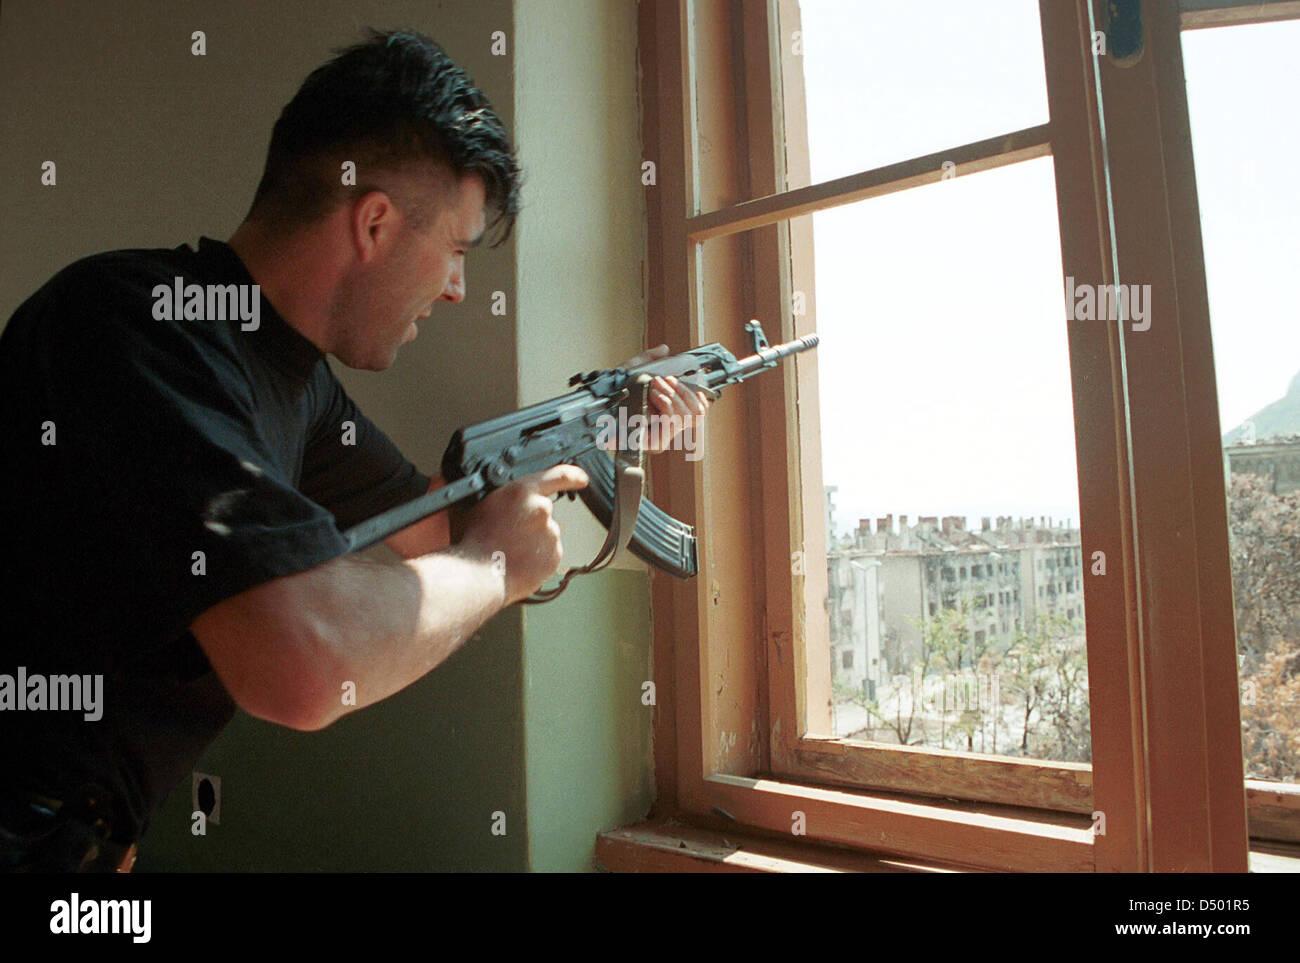 MOSTAR, BOSNIA, 17 AUGUST 1993 --- A Bosnian Croat soldier shoots out of a window at Bosnian Moslems defending their - Stock Image